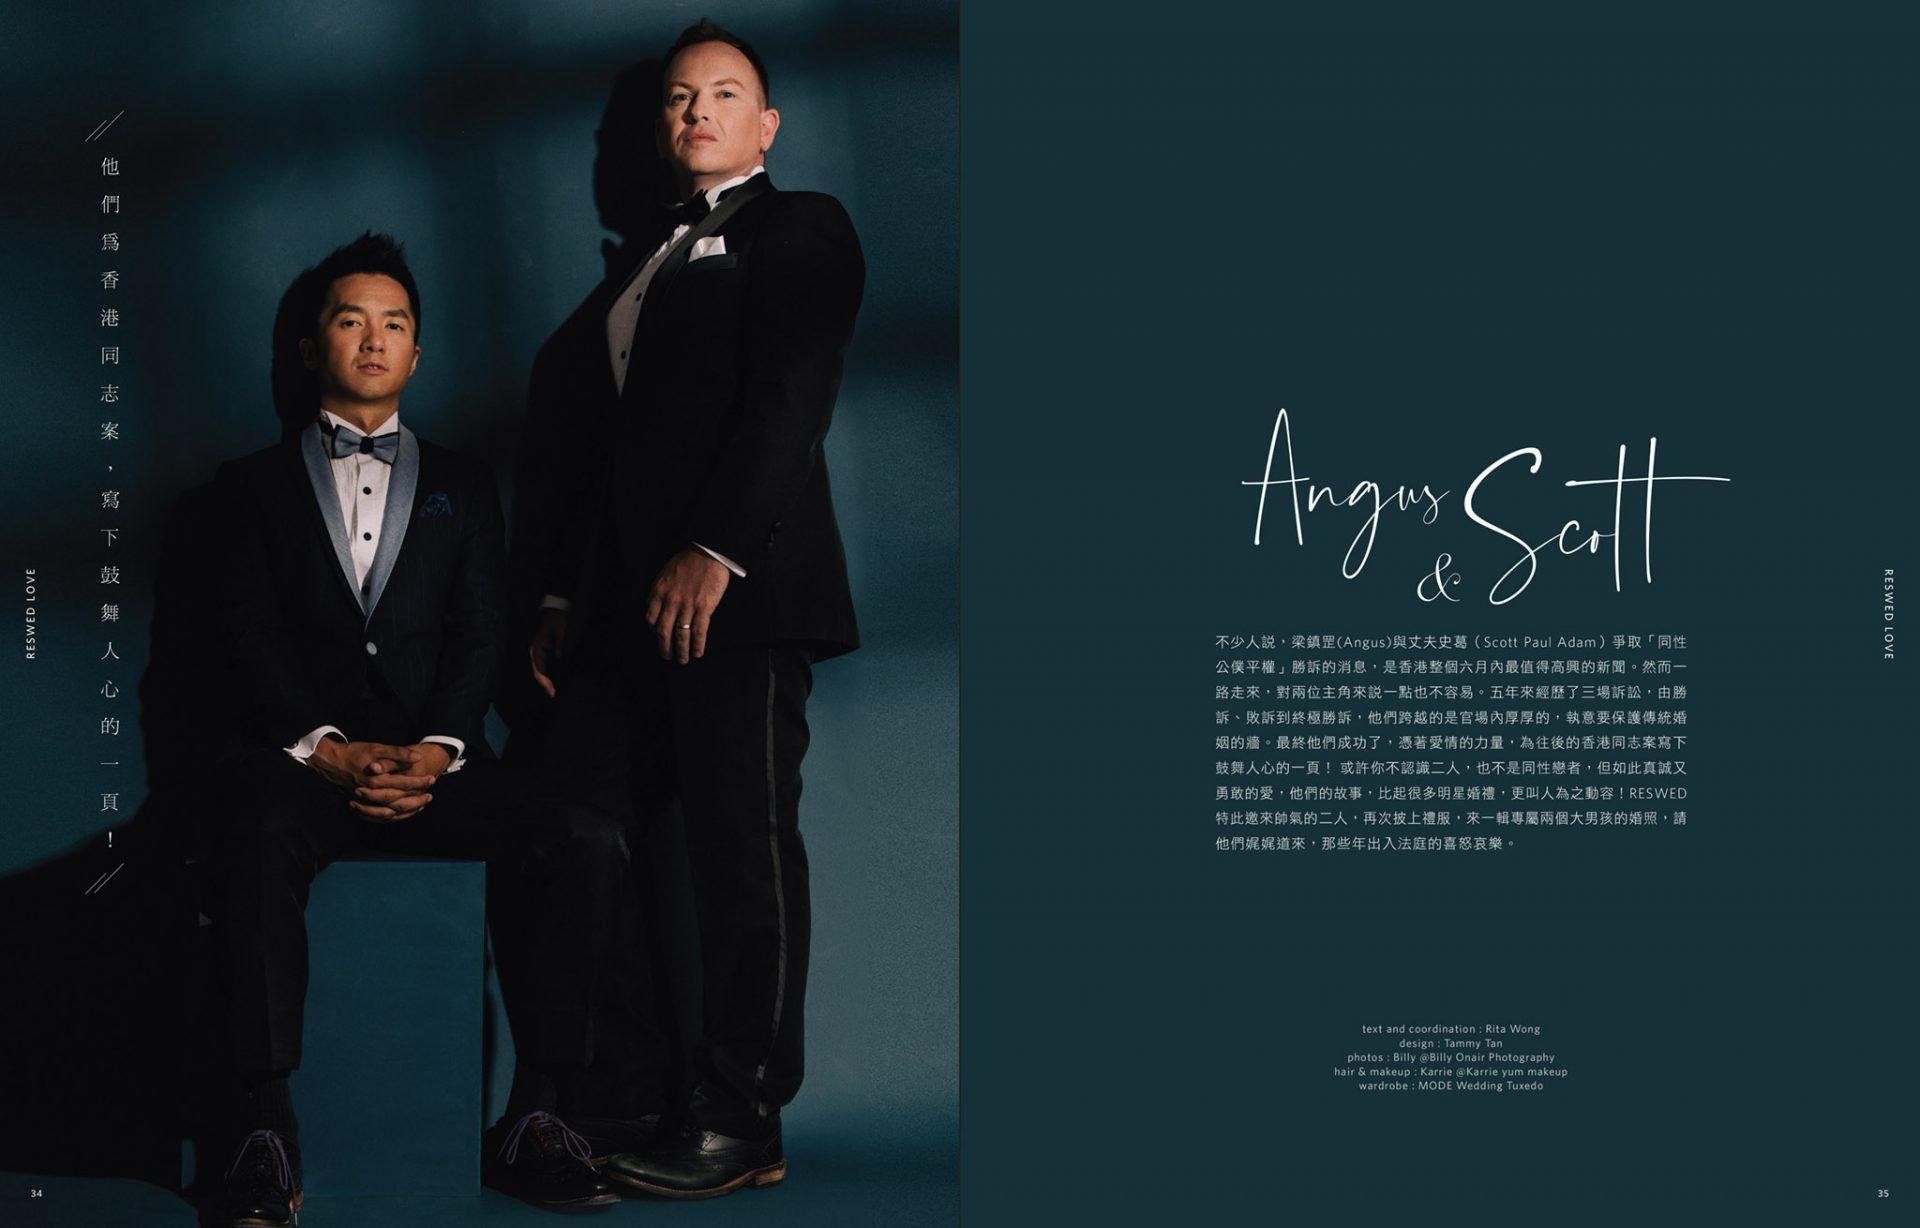 Angus and Scott |同志平權的新一頁|Research Wedding Interview